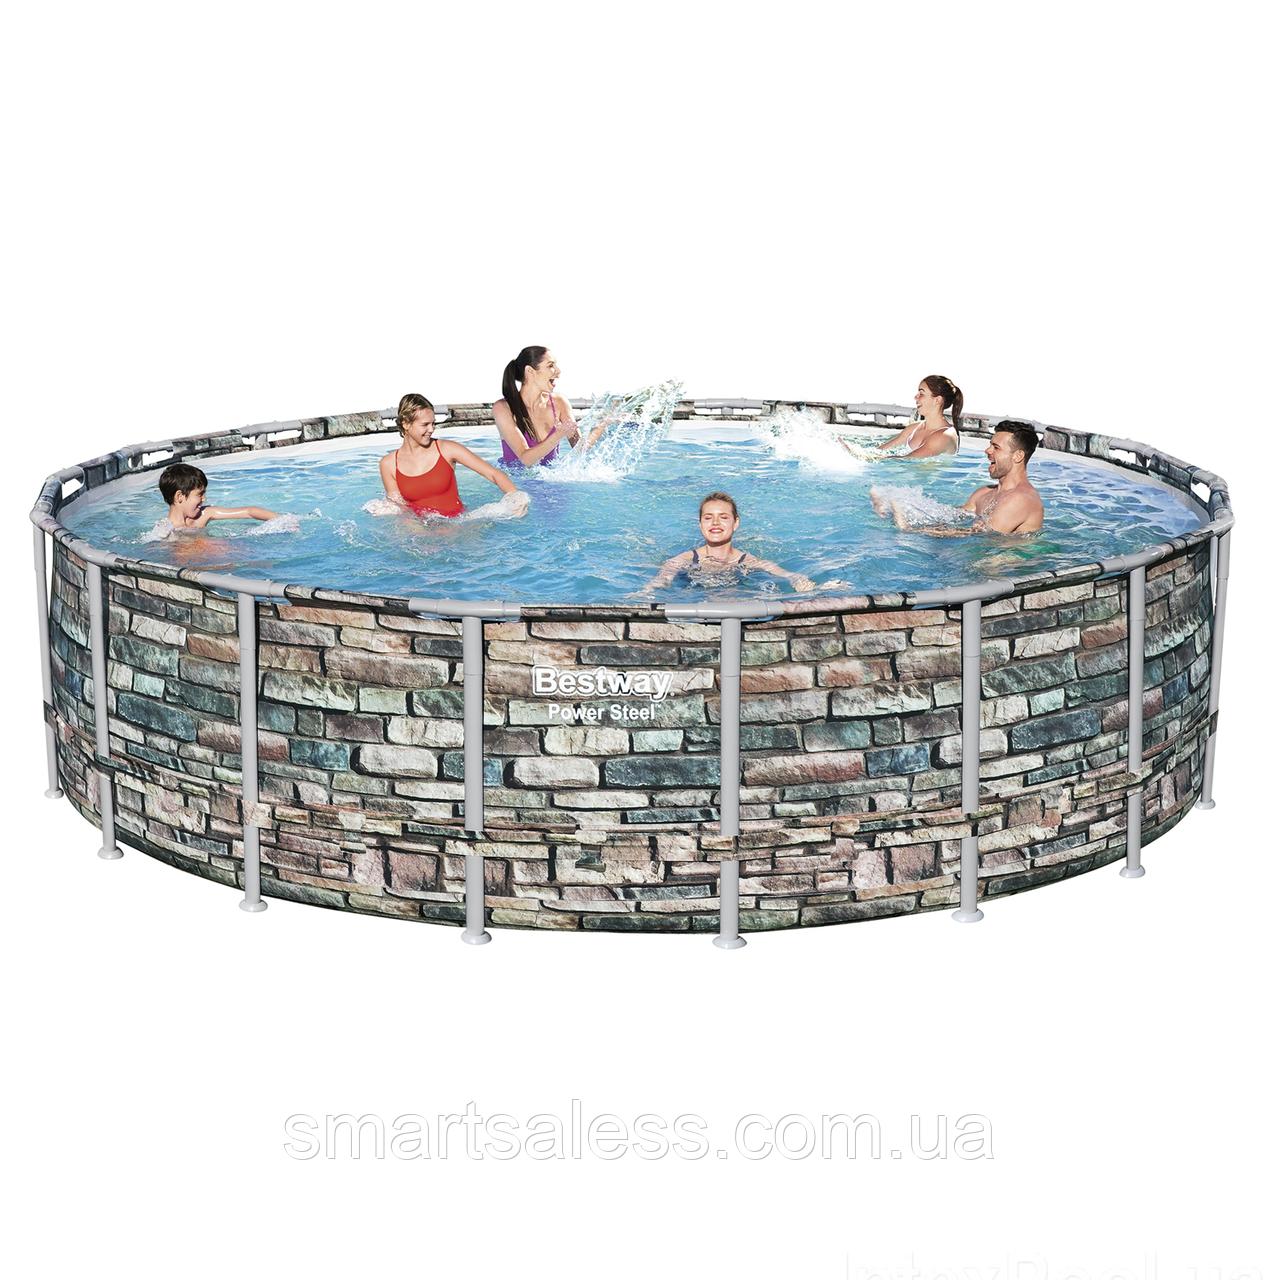 Каркасний басейн, чаша + каркас, 549 x 132 см